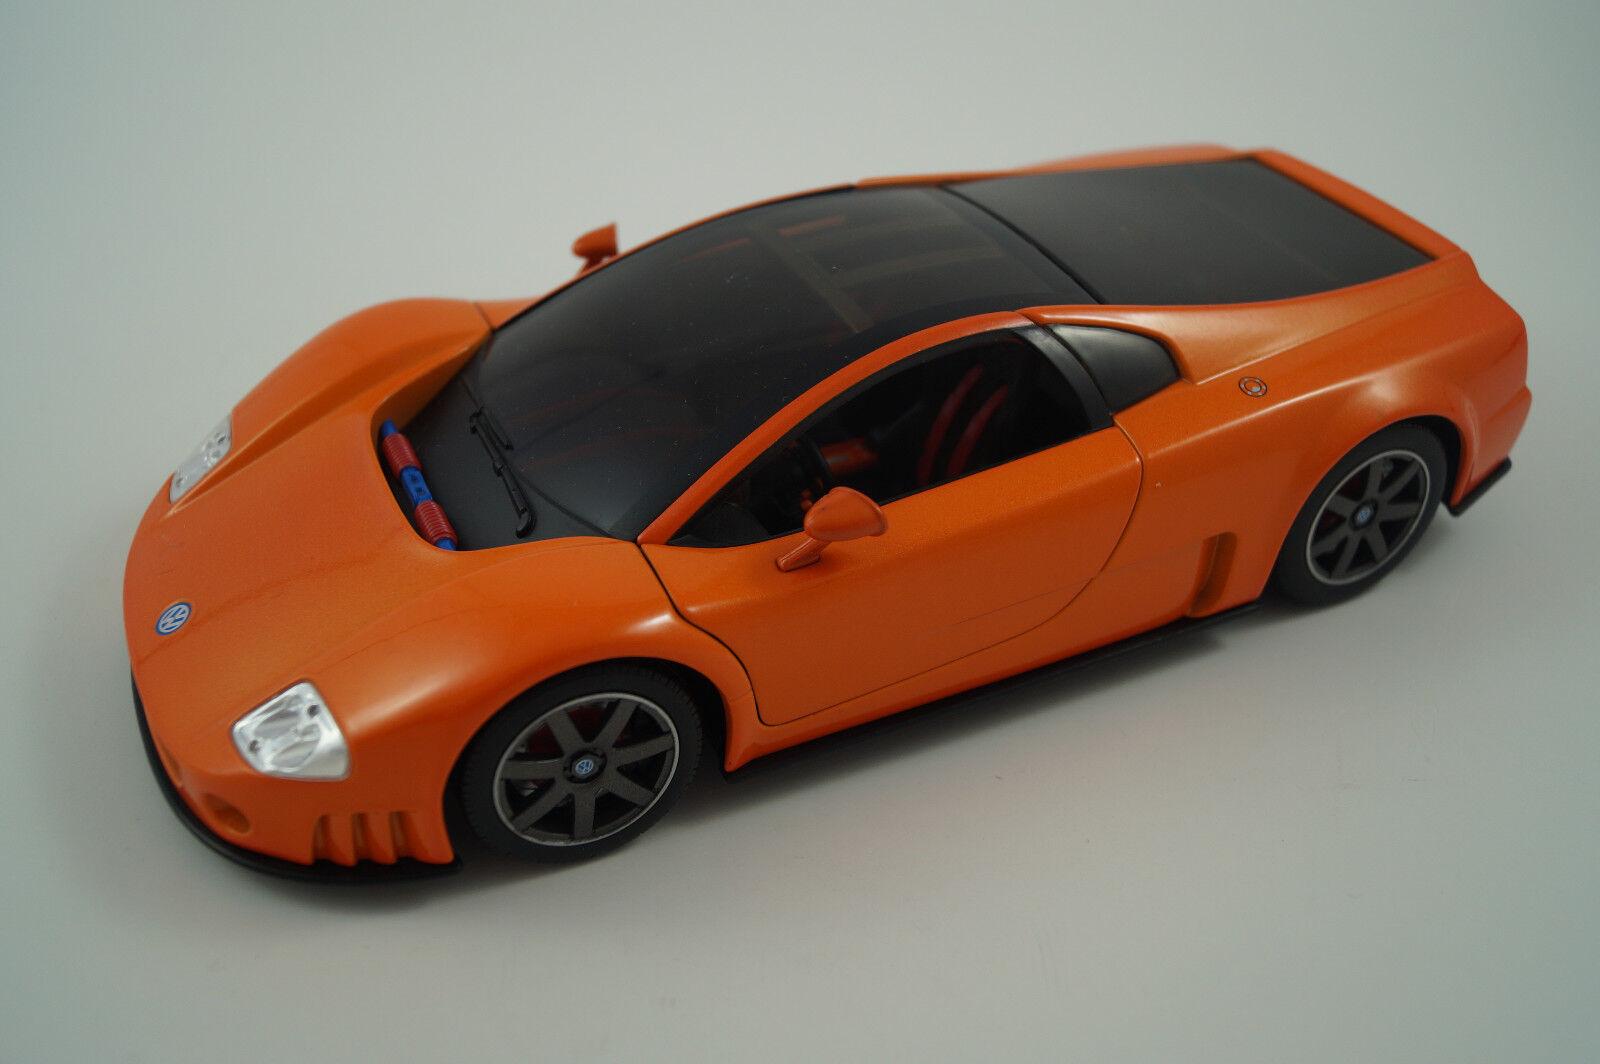 ROAD SIGNATURE voiture miniature 1 18 Volkswagen VW w12 Nardo